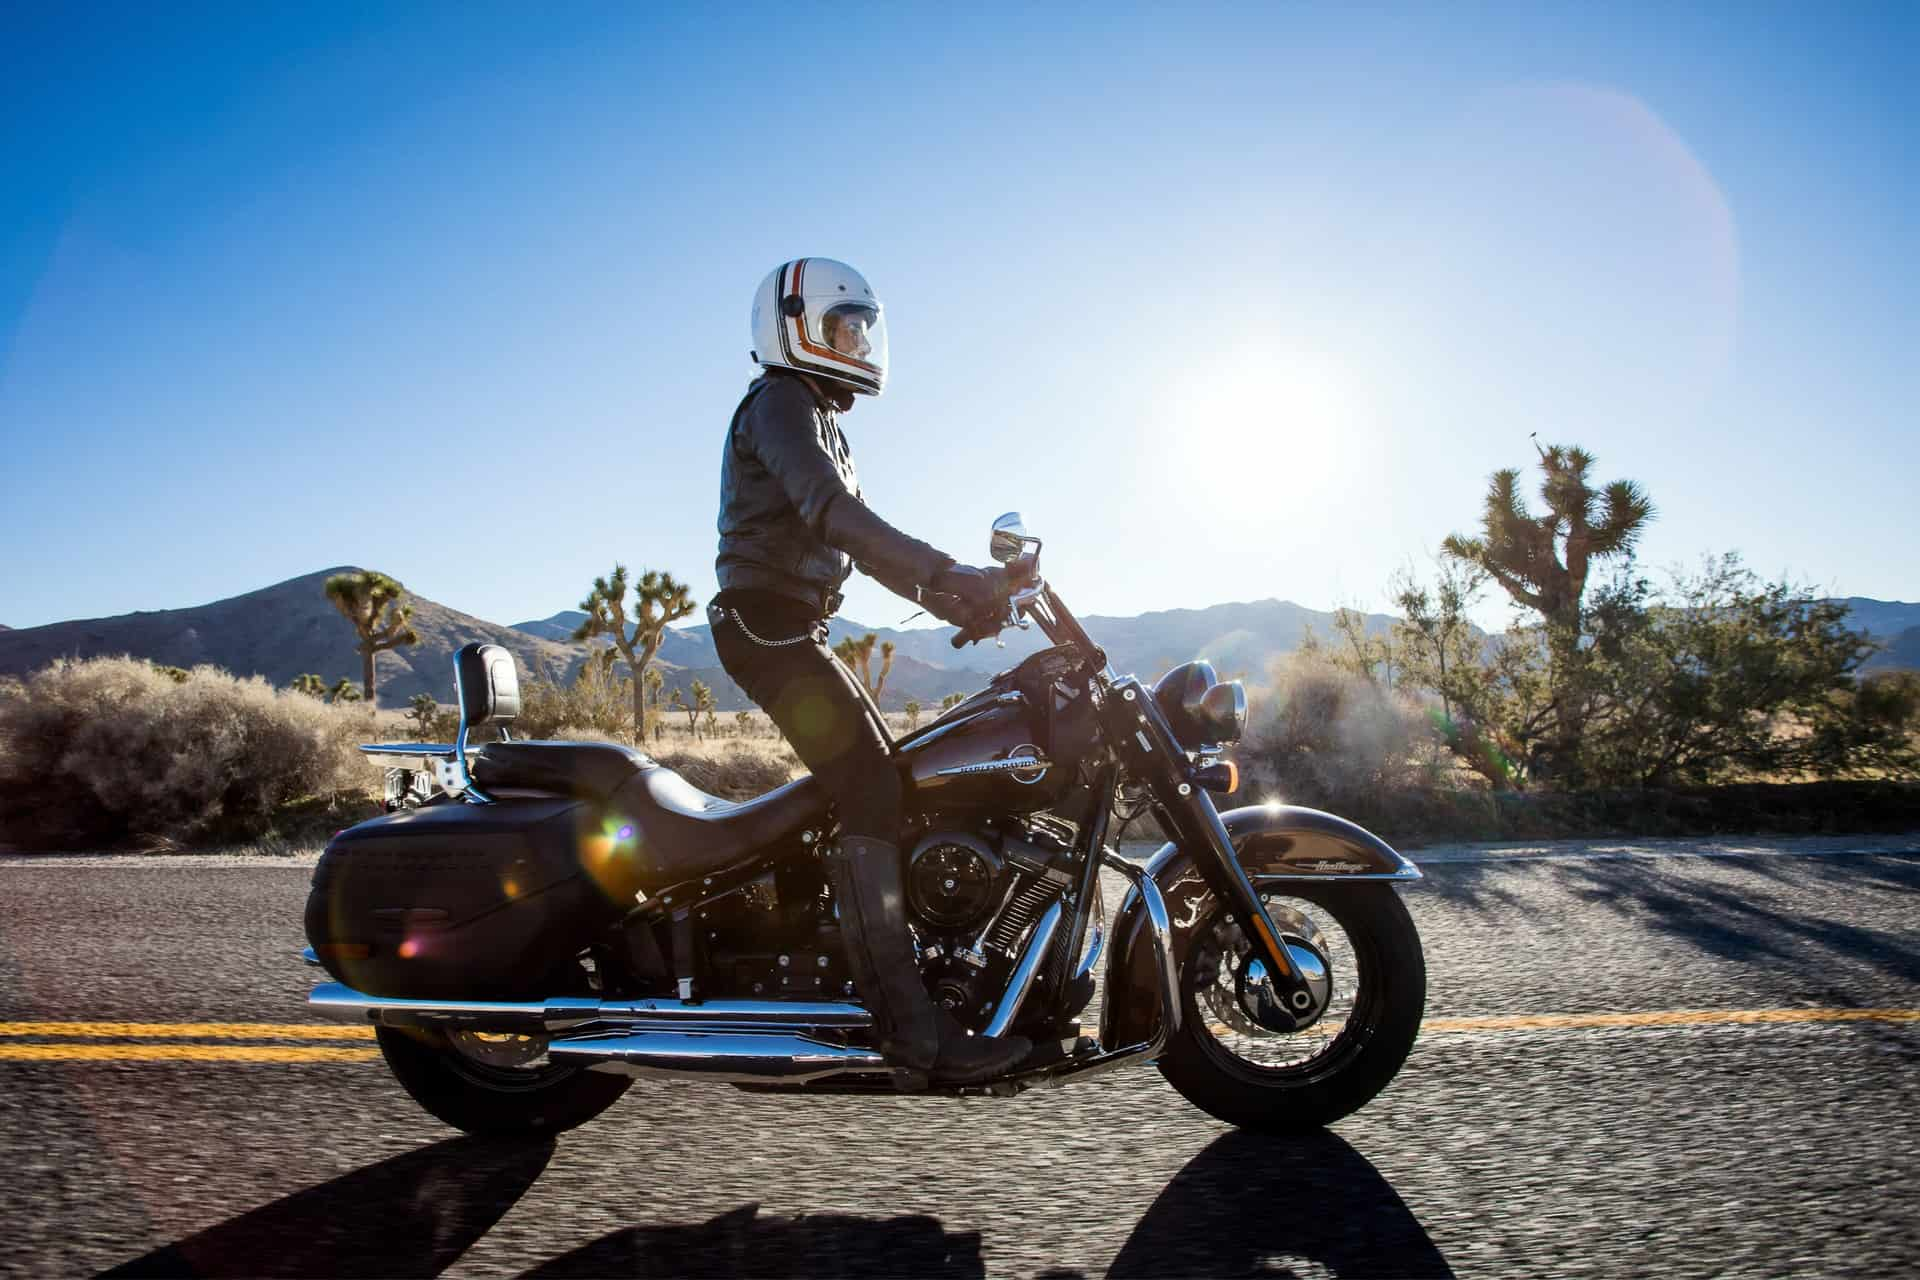 rider standing sunny day